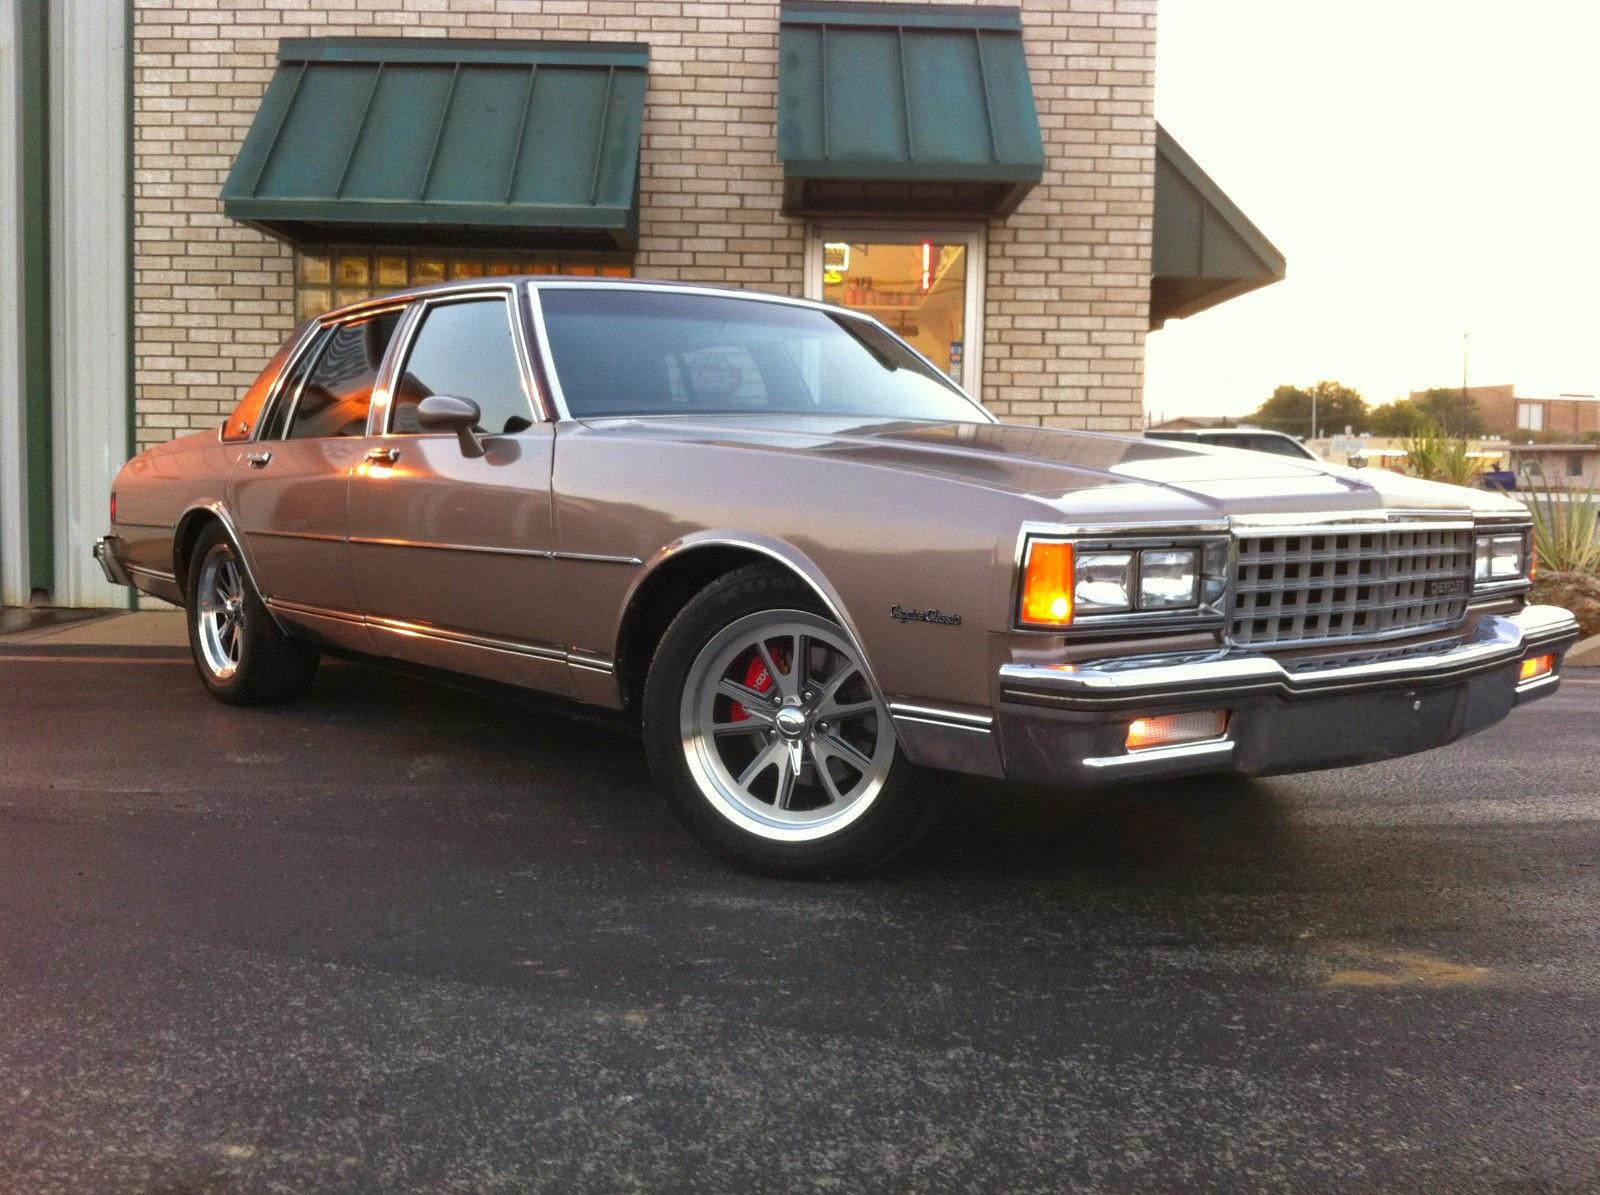 Daily Turismo: 10k: Hot Rod: 1984 Chevrolet Caprice